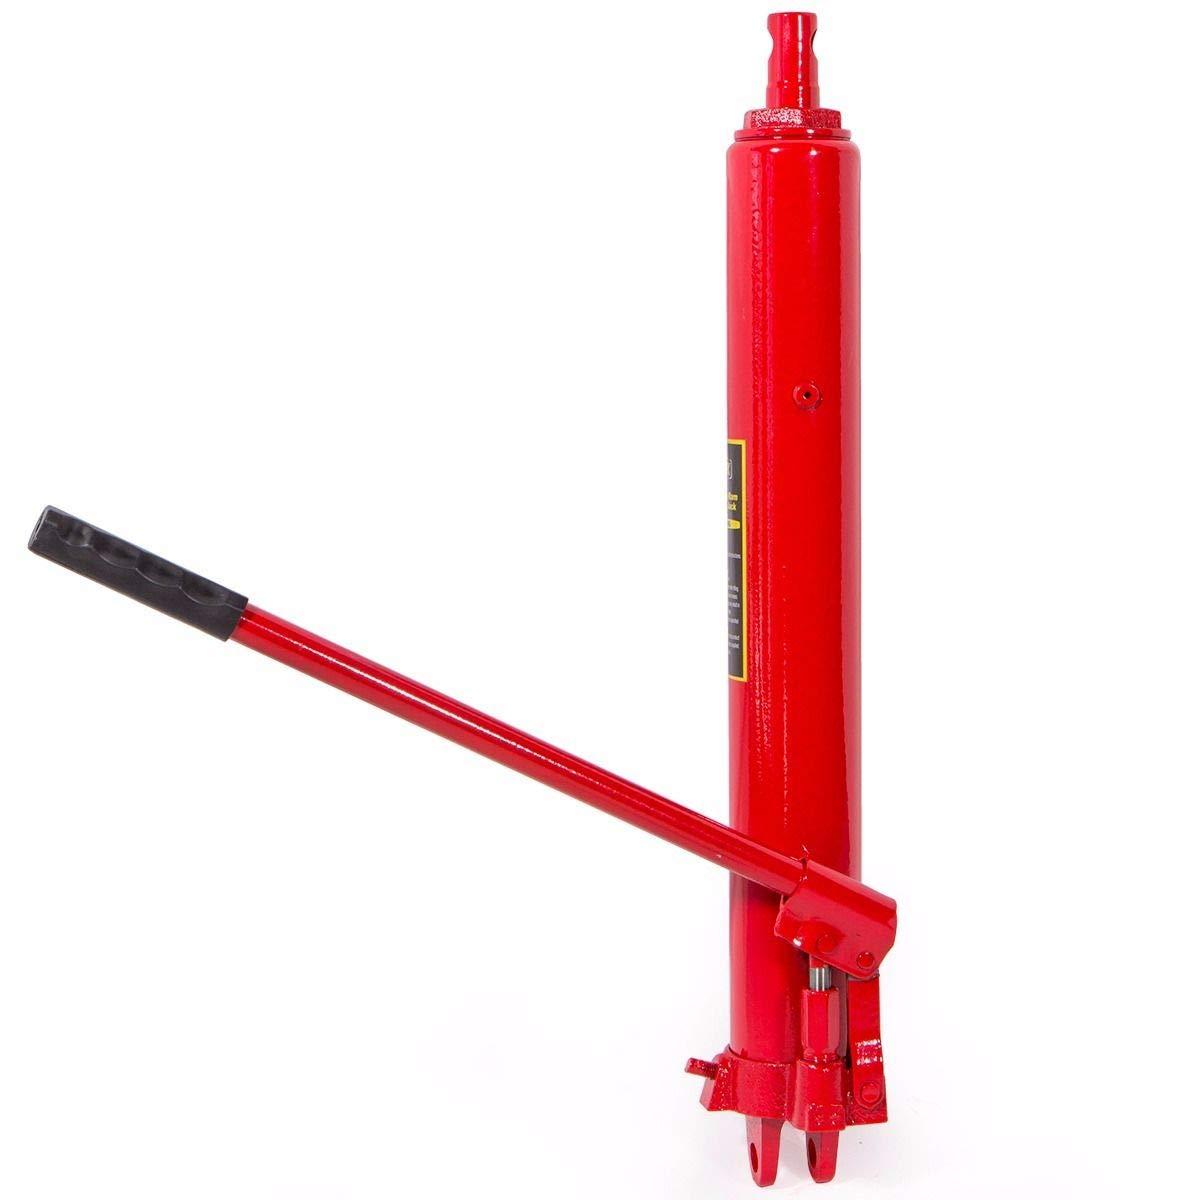 KCHEX>8 ton Long Manual Hydraulic Ram Jack Pump Engine Lift Hoist Cherry Picker>Heat-Treated Chrome ram for Strength and Durability.